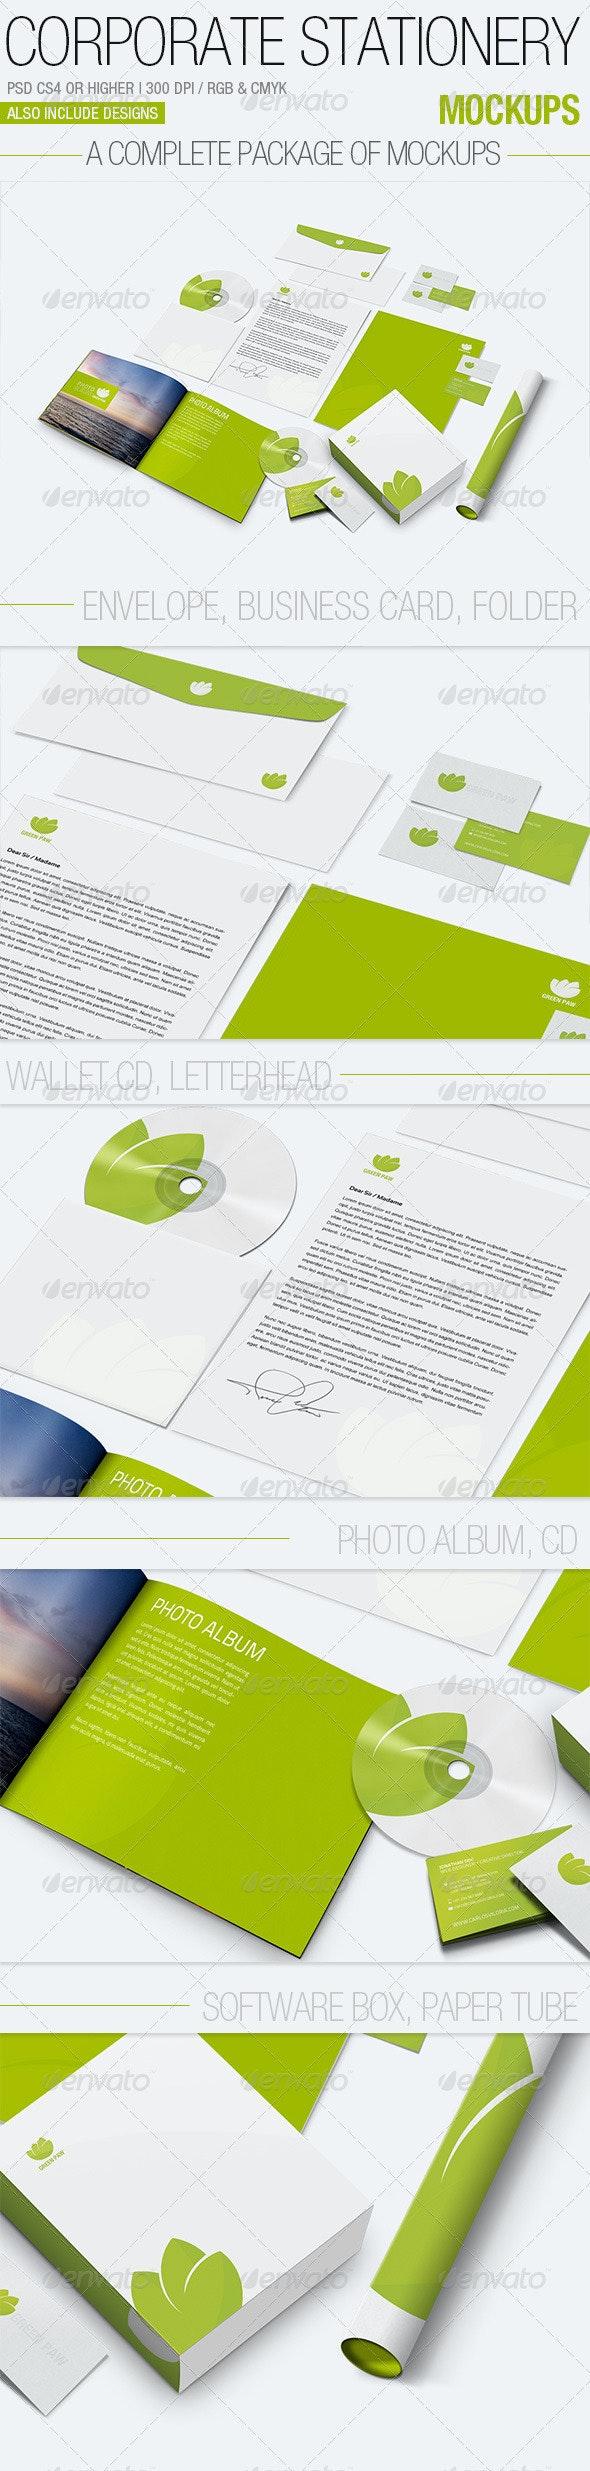 Corporate Stationery Mockups - Stationery Print